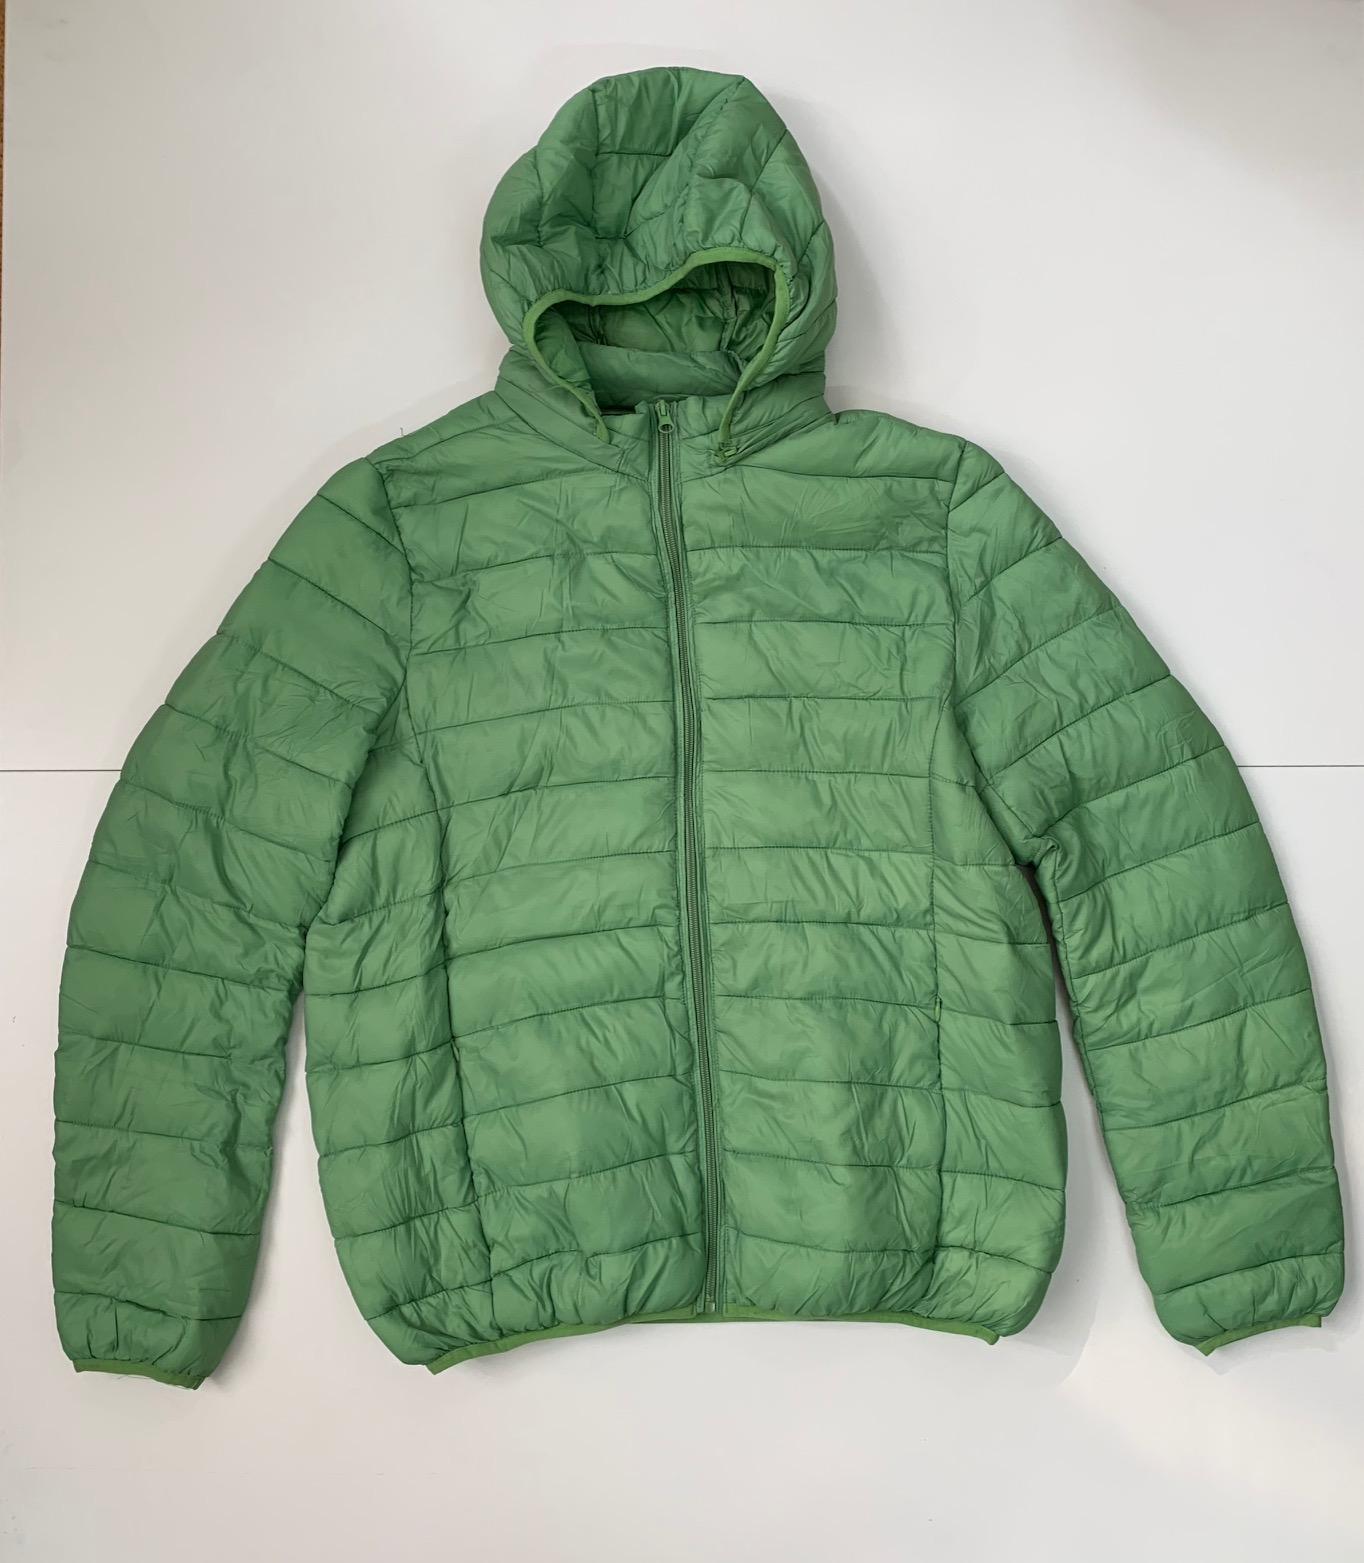 Мужская зеленая куртка от NAGATA